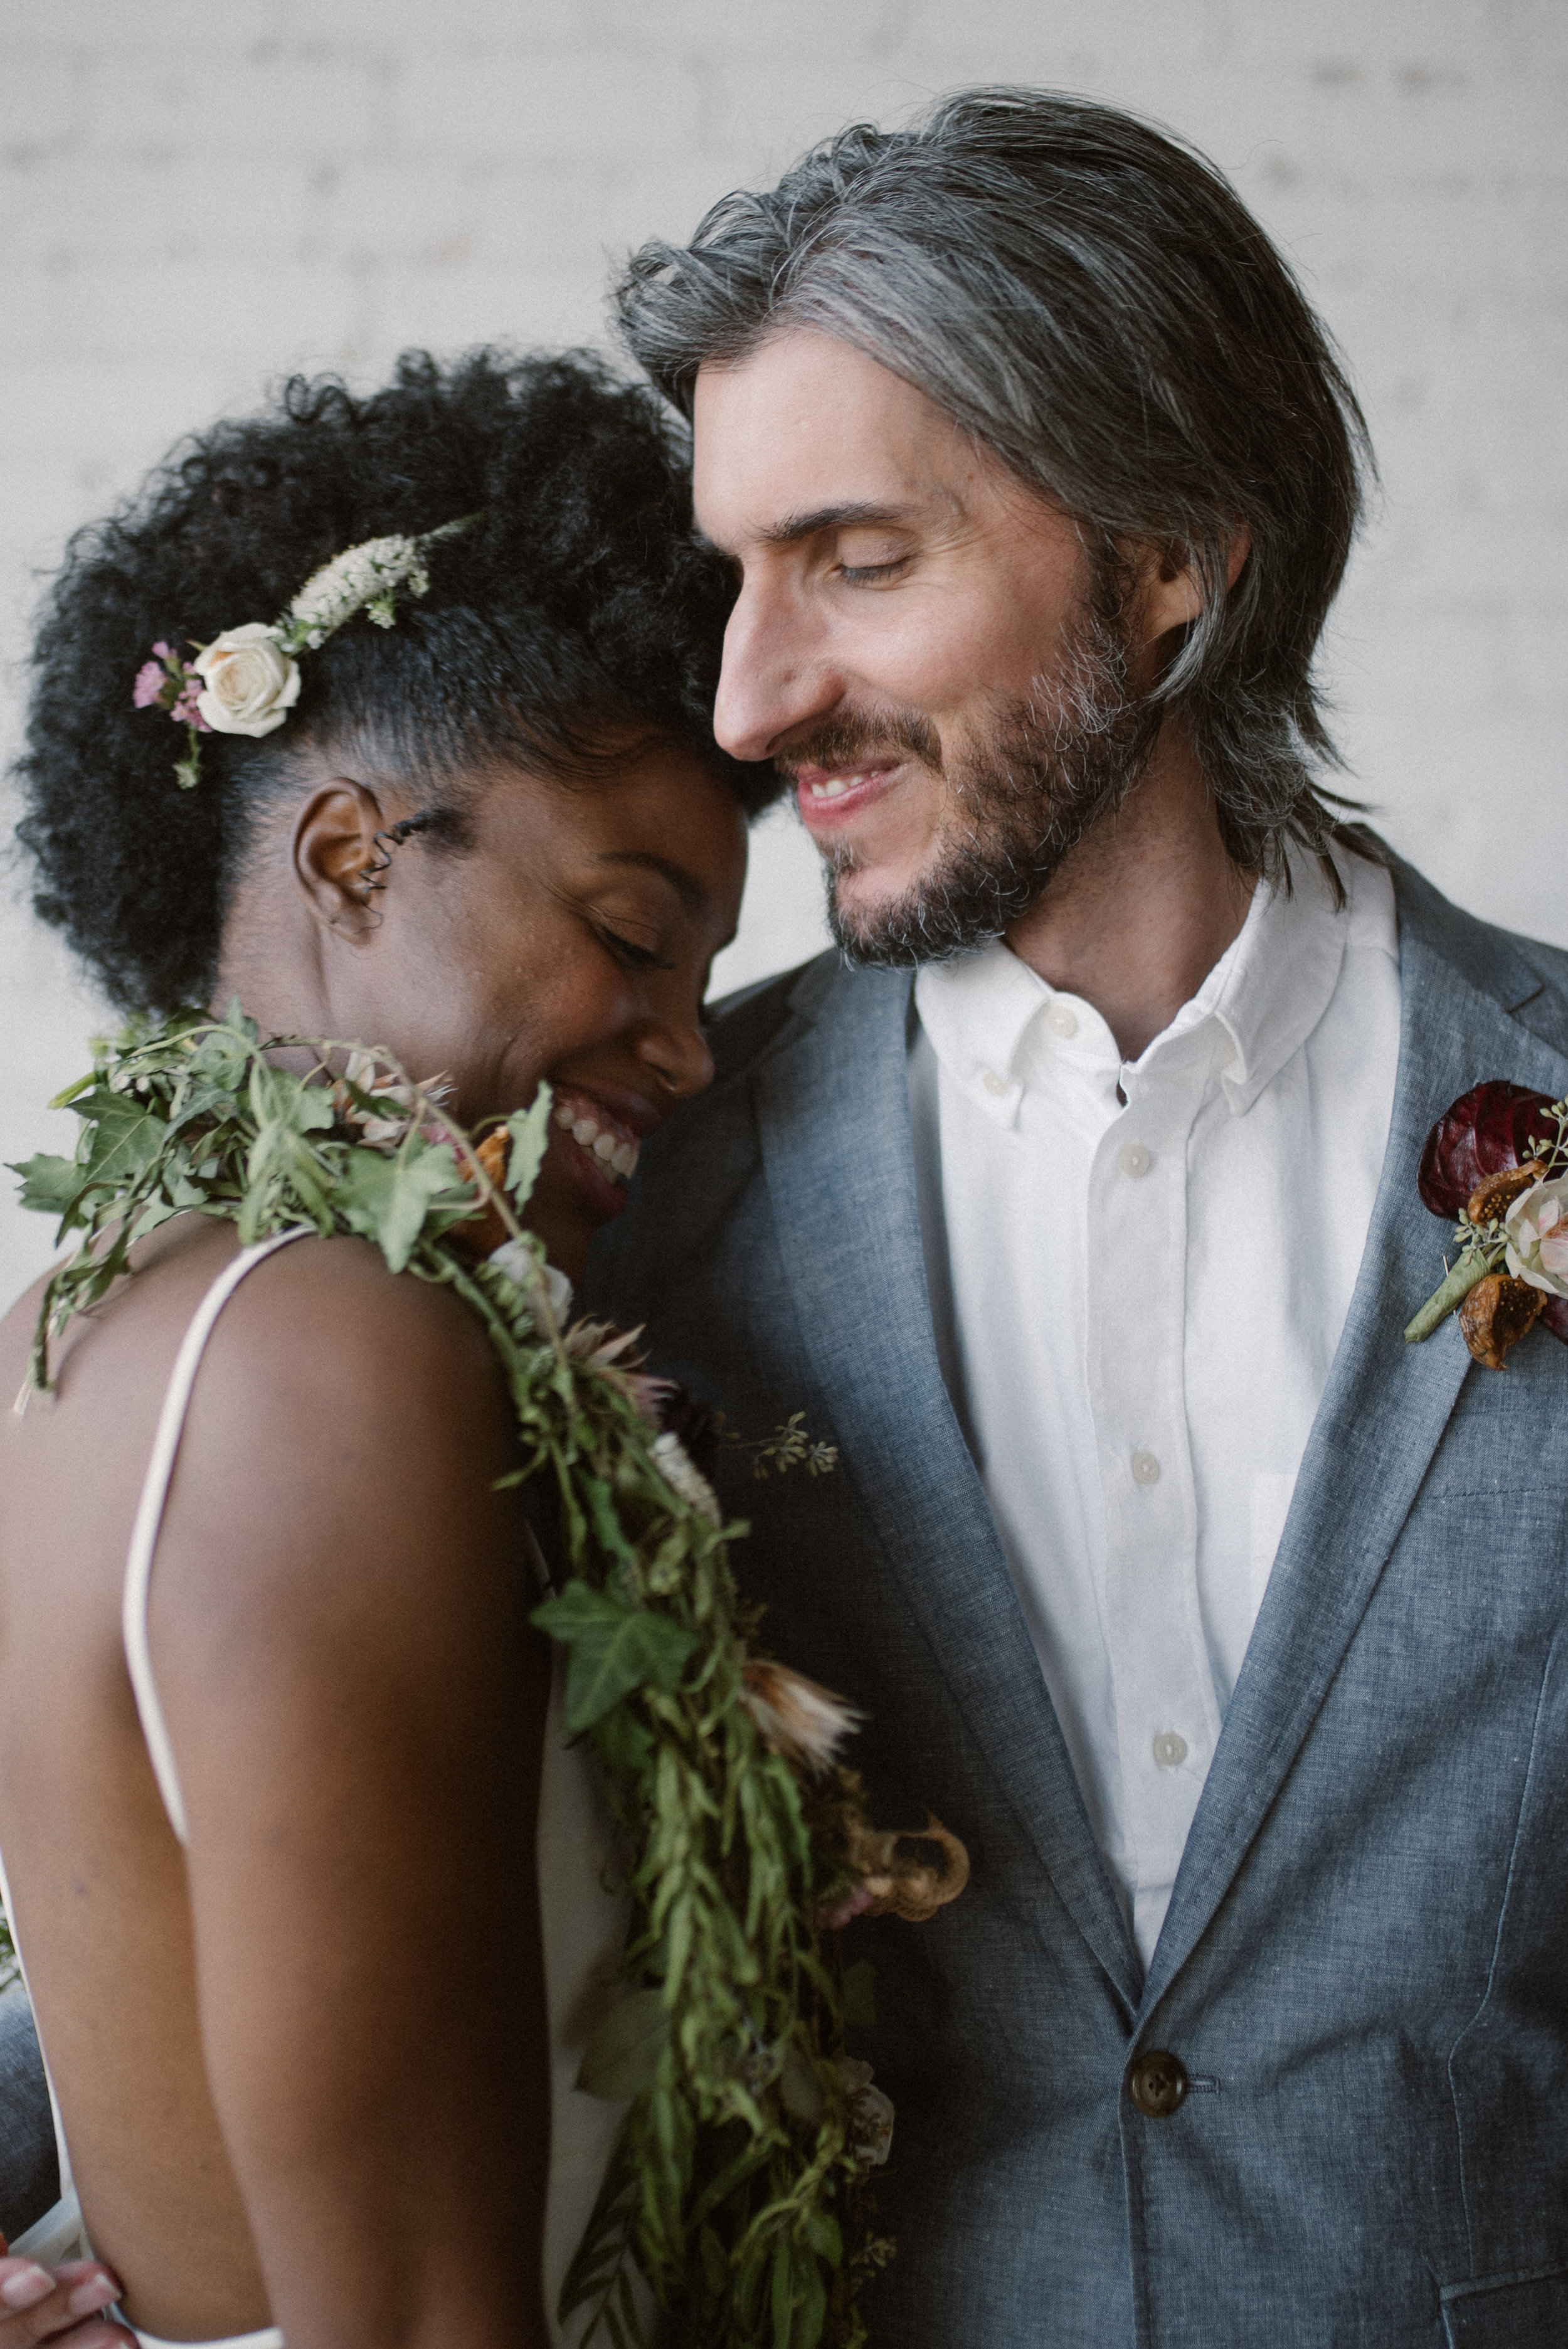 haus-820-minimal-editorial-wedding-styled-shoot-46.jpg